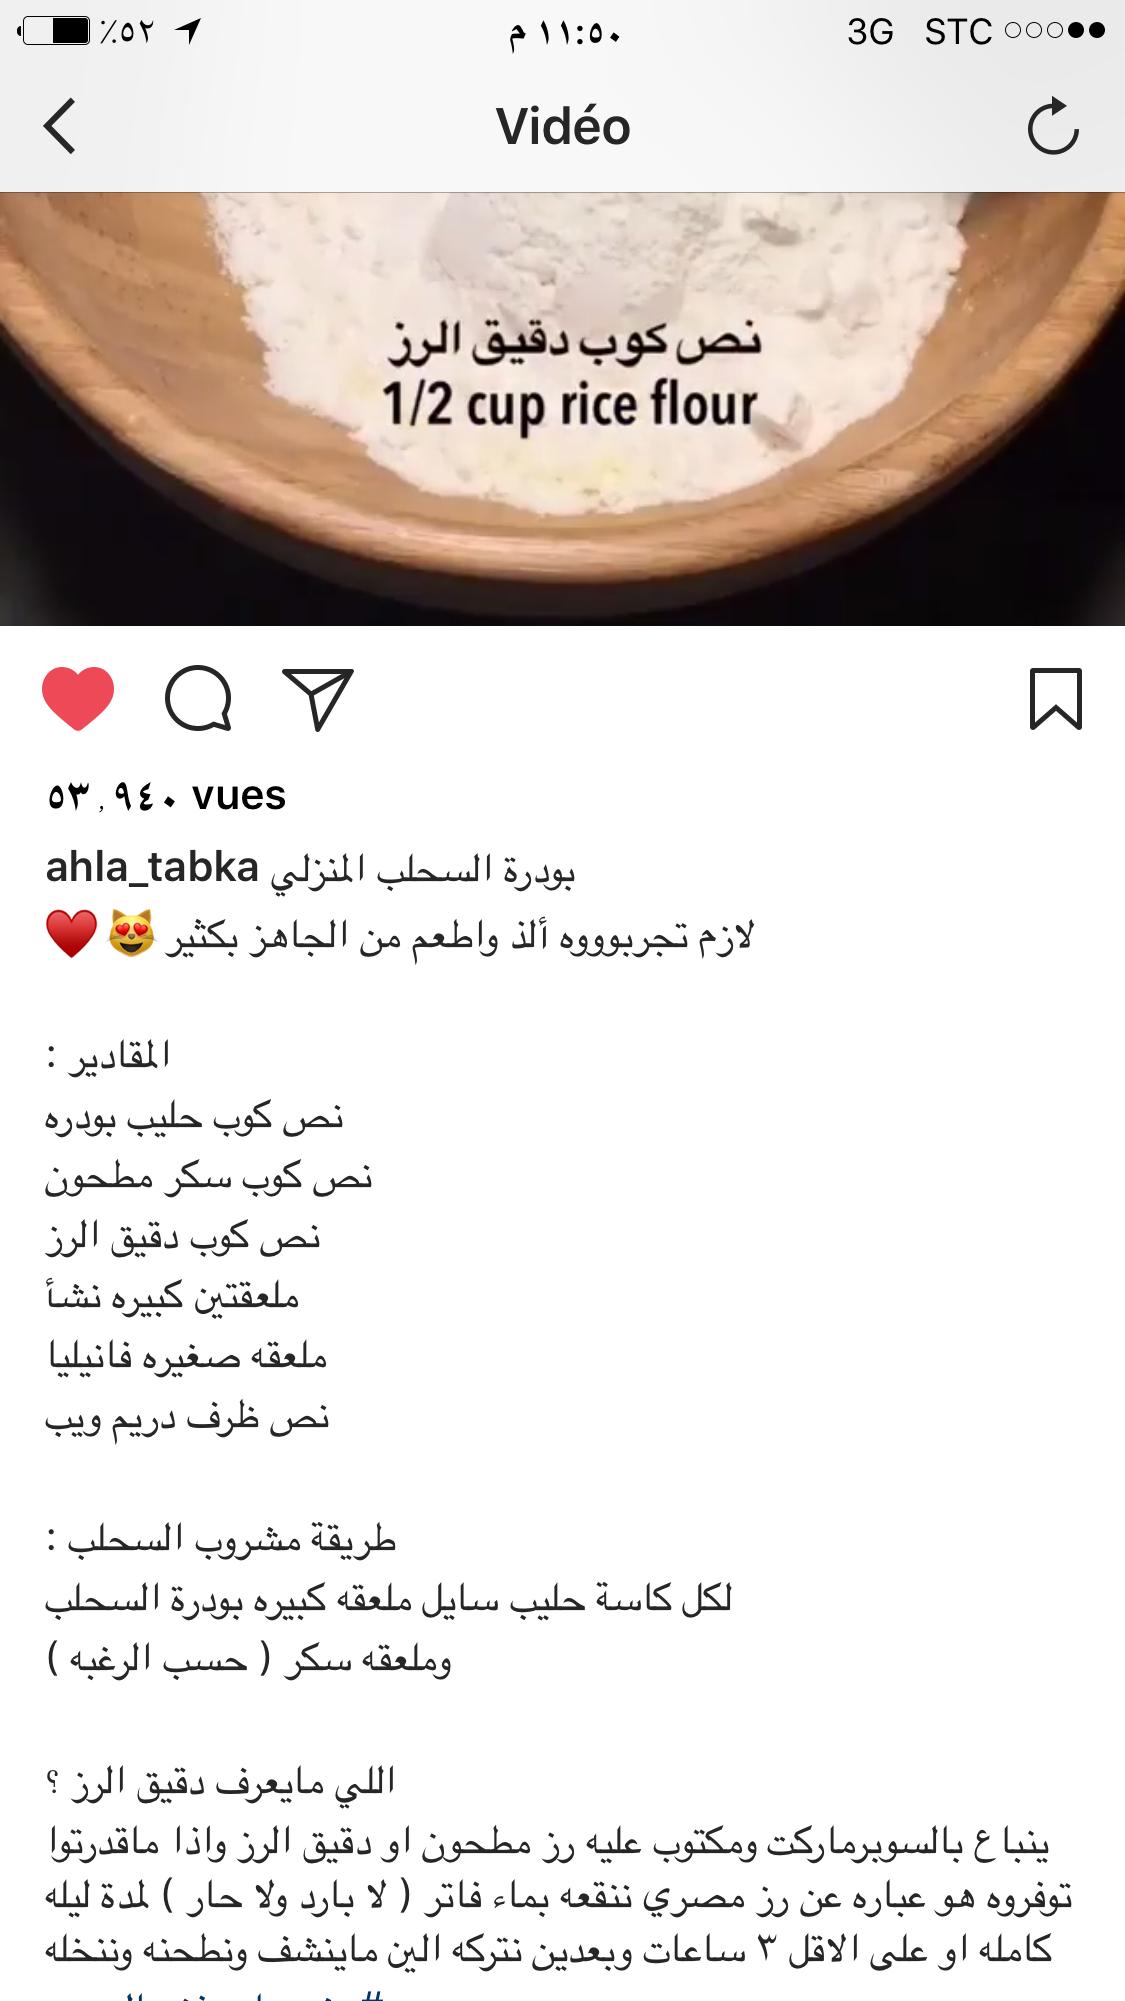 بودرة السحلب المنزلي Desert Recipes Cooking Recipes Recipes